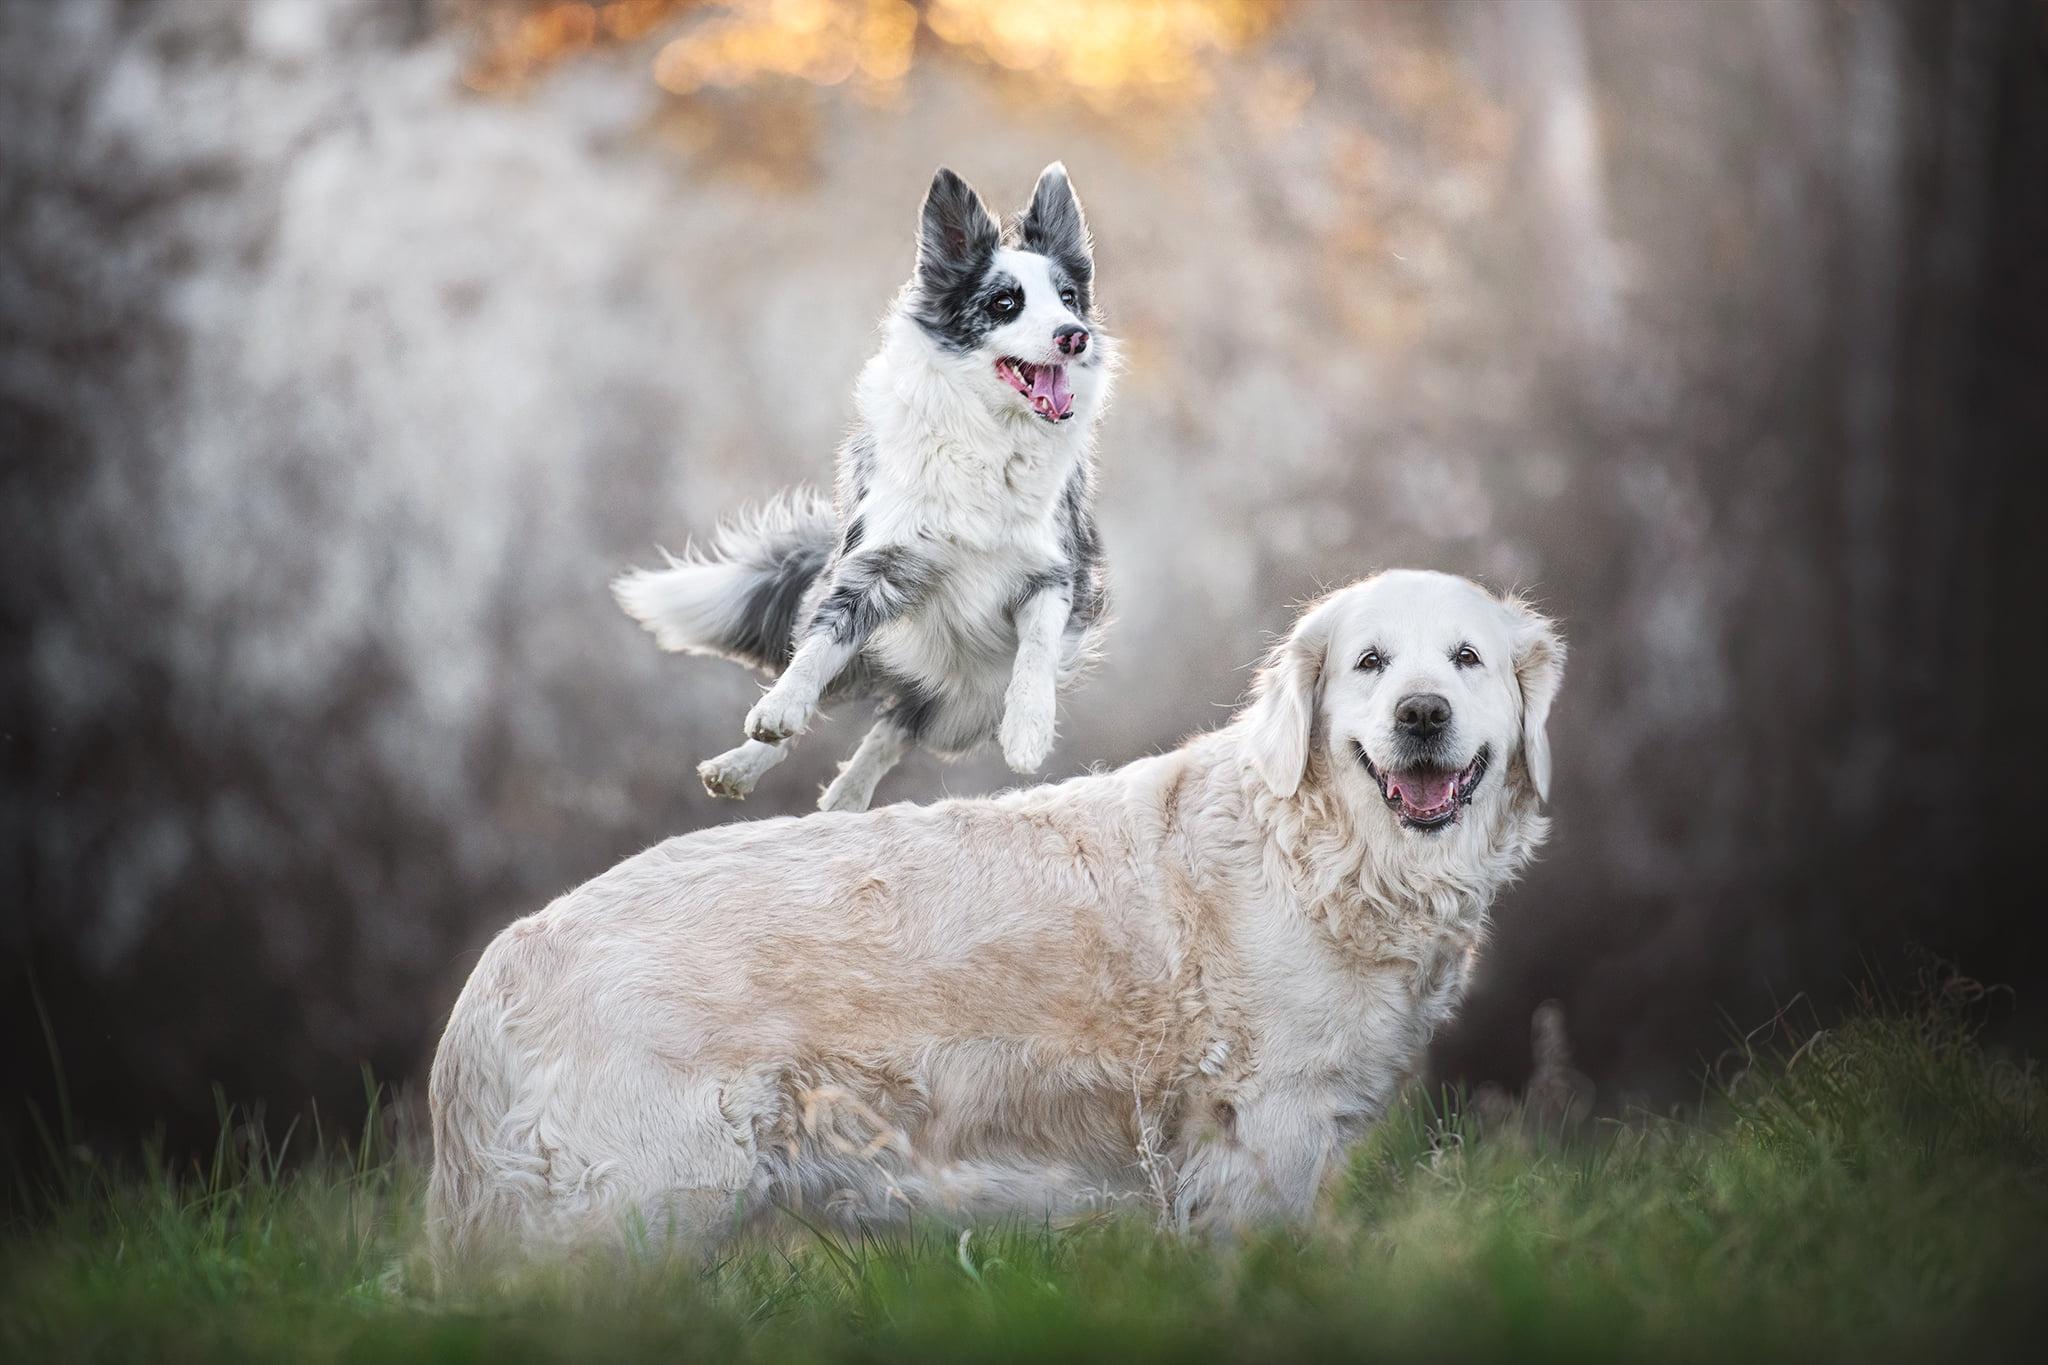 Dog Animals Mammals Outdoors 2048x1365